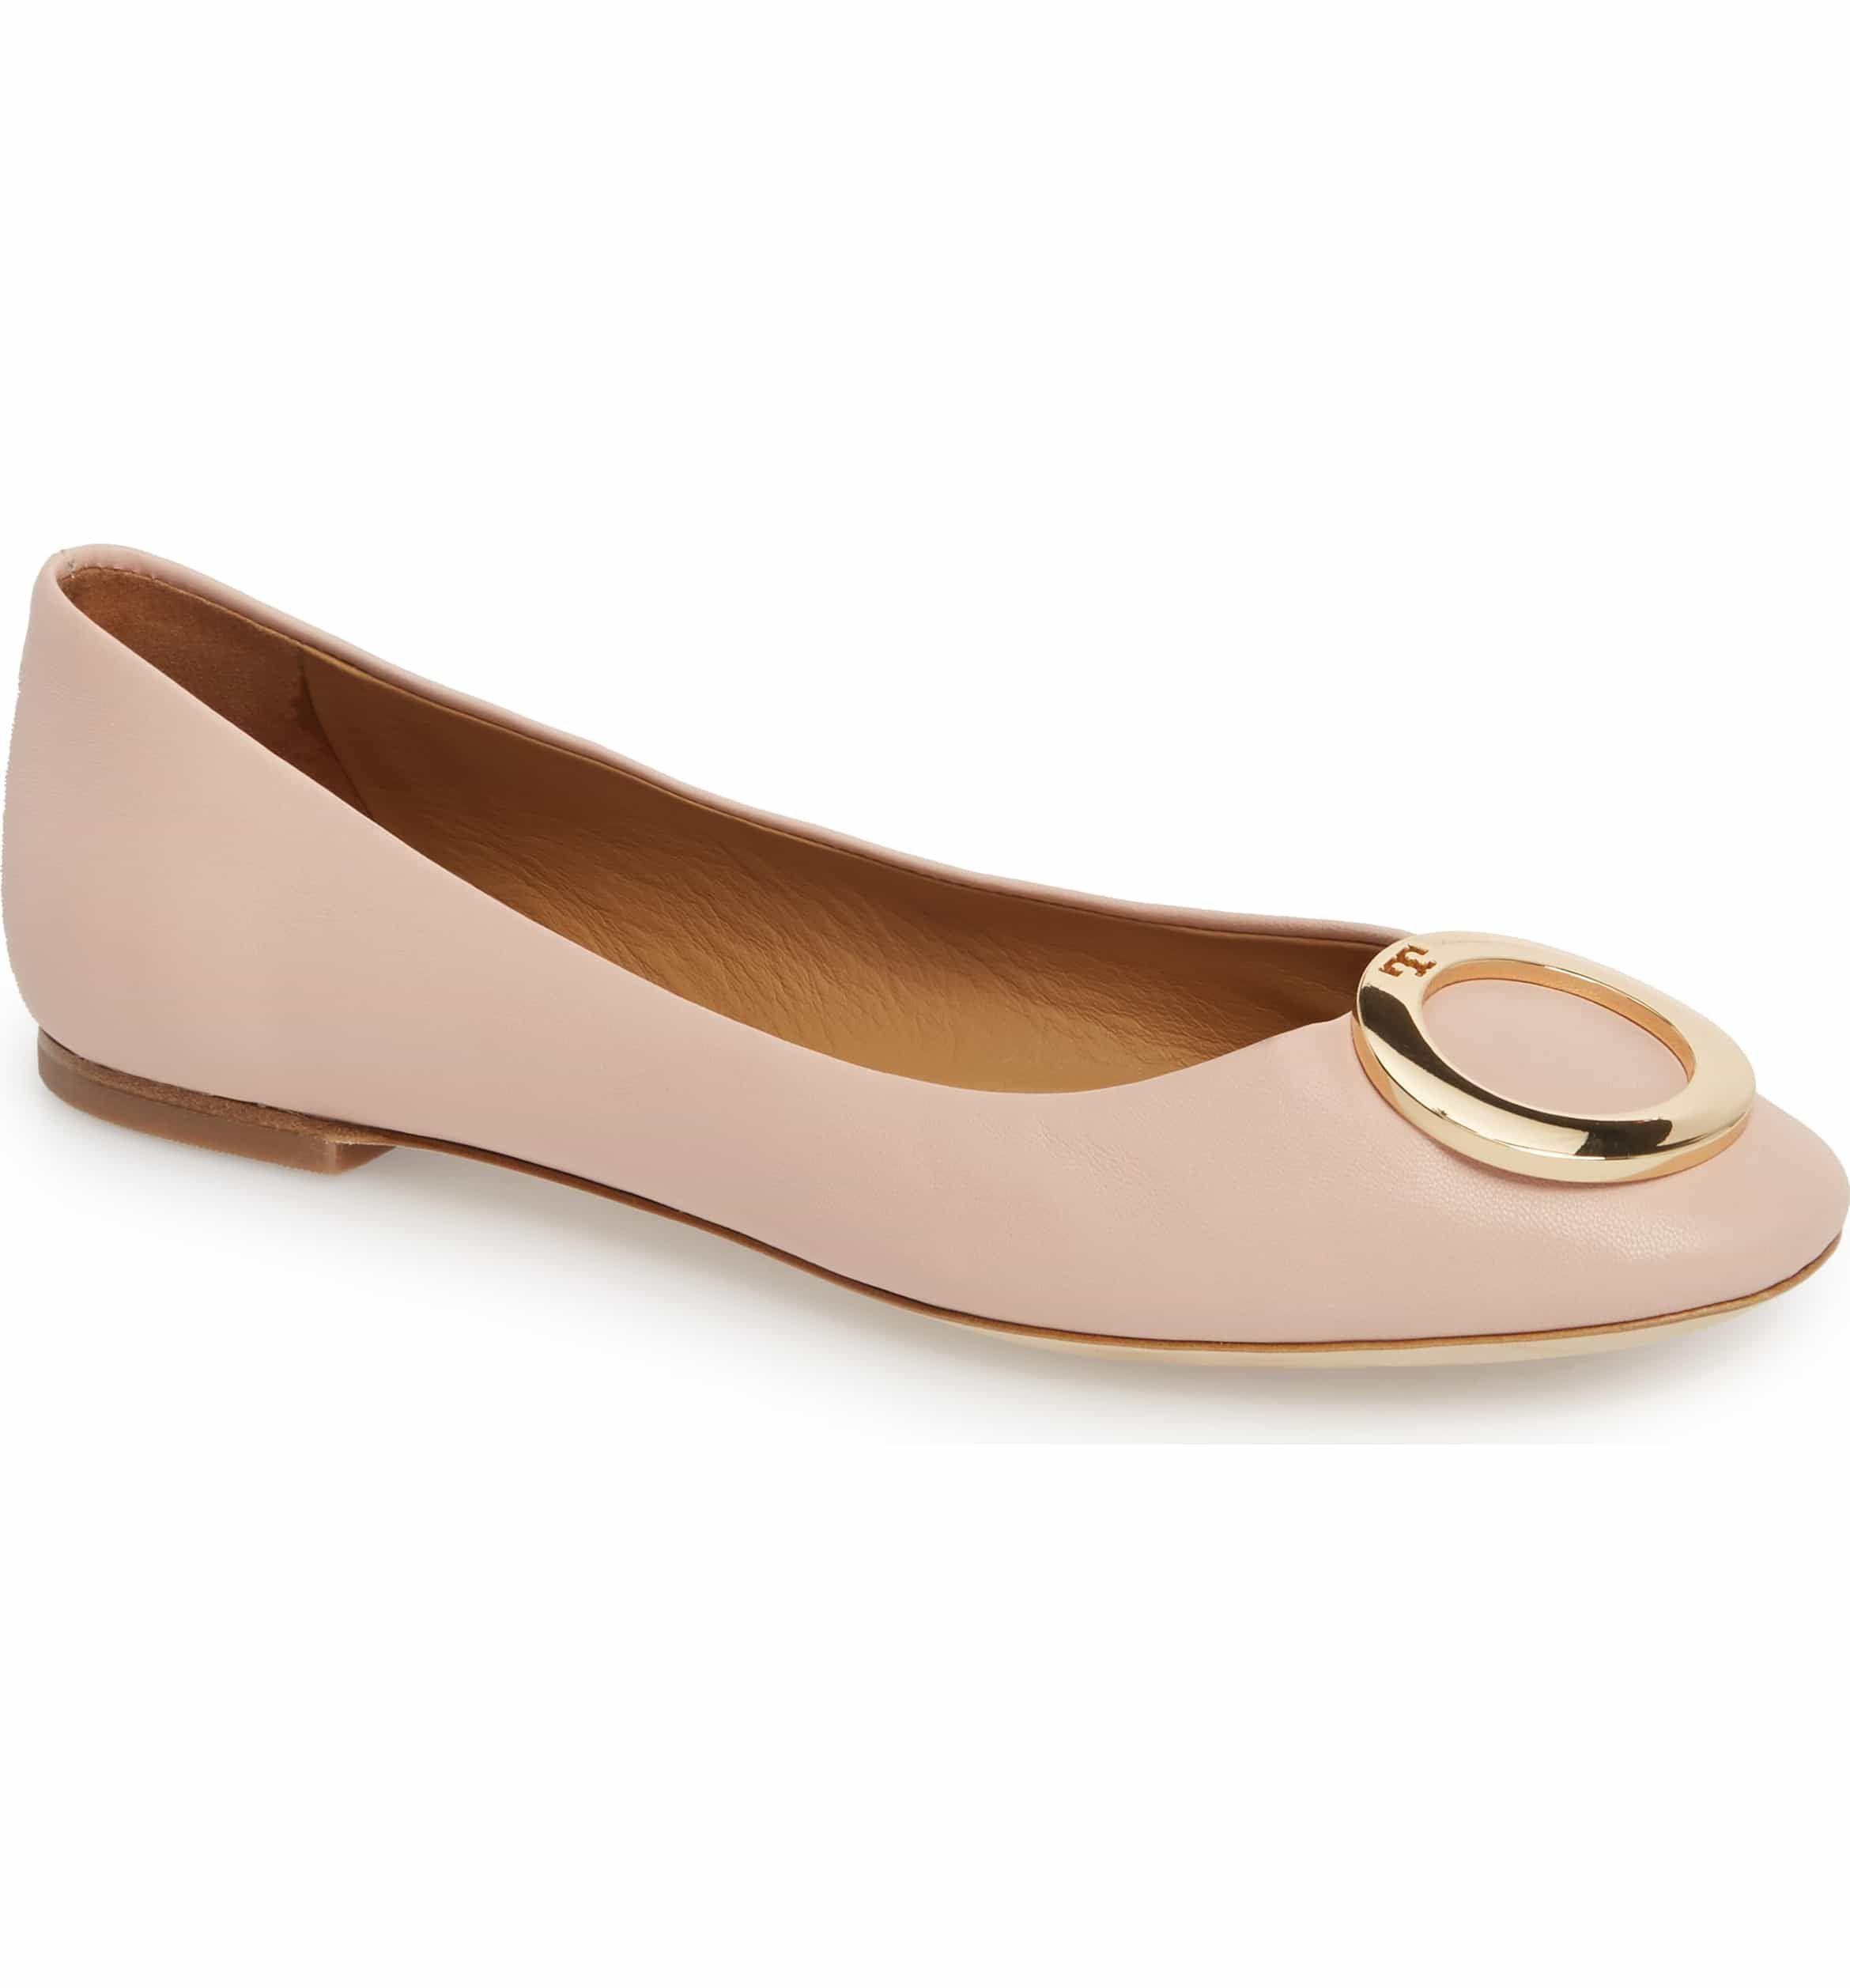 b5b04661c076 Caterina Ballet Flat